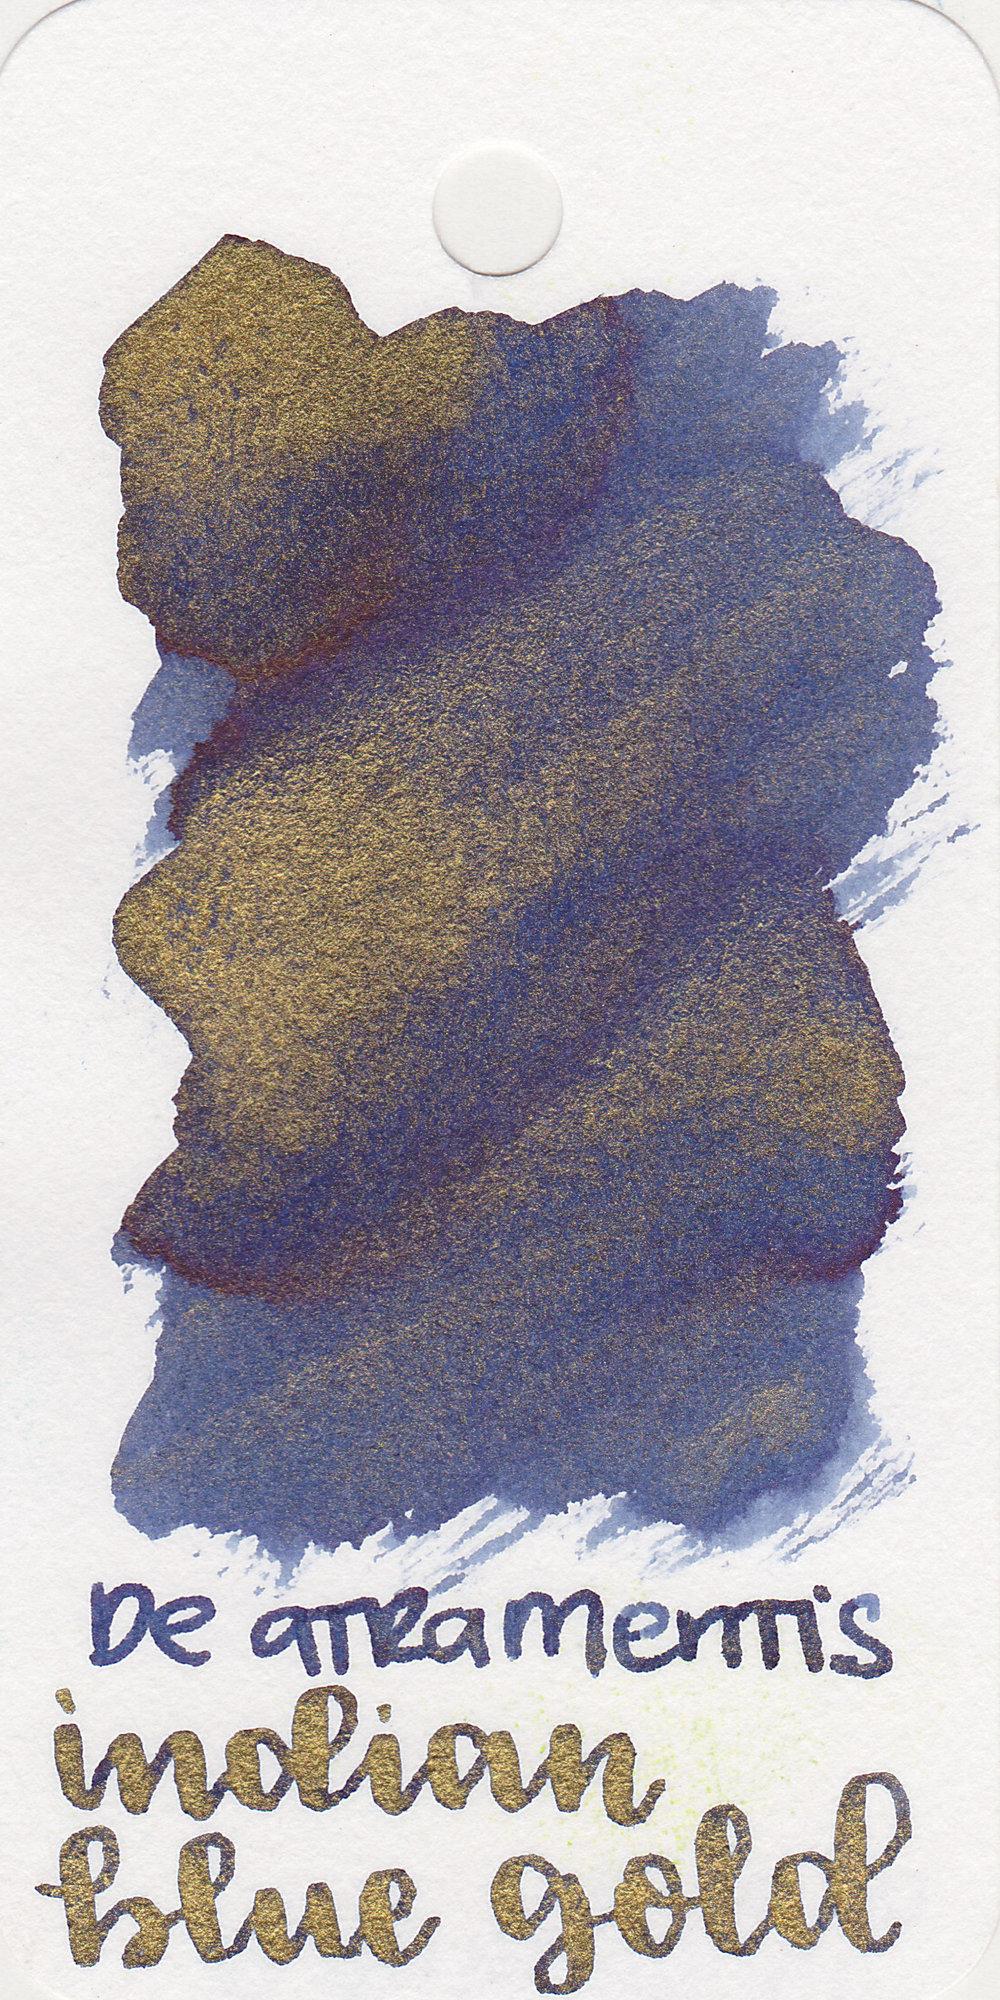 da-indian-blue-gold-1.jpg